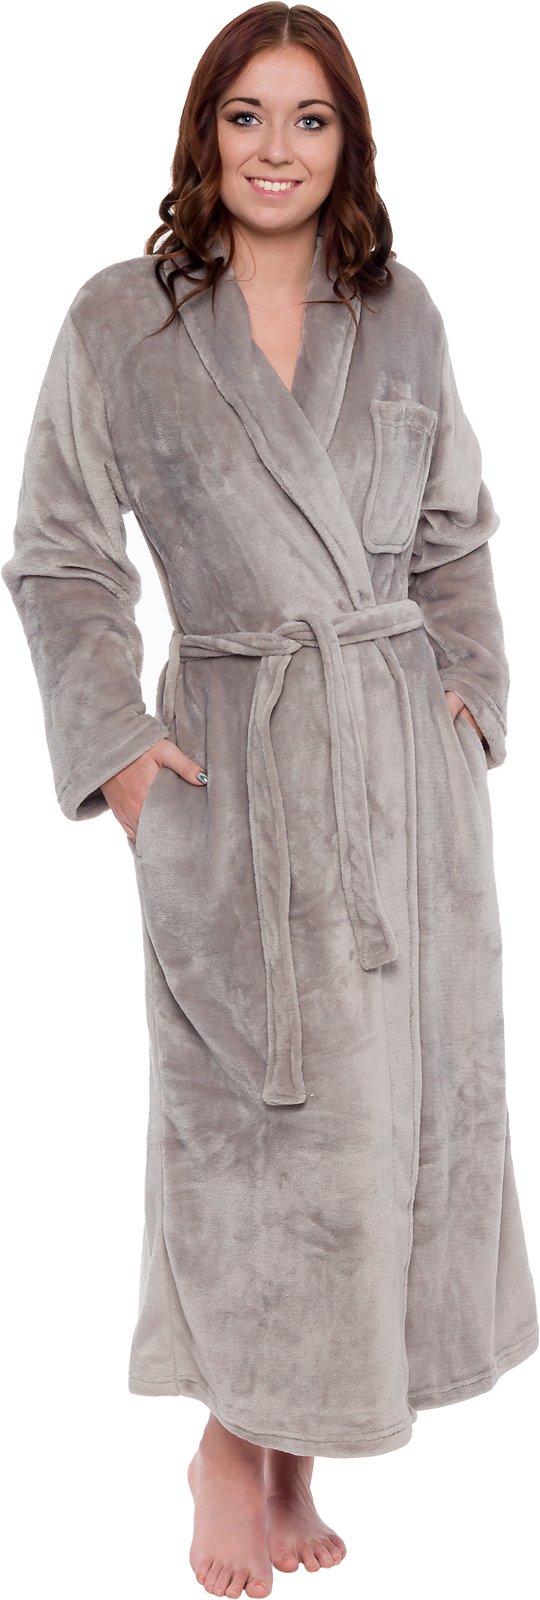 Silver Lilly Women's Full Length Luxury Long Bathrobe - Soft Plush Comfy Long Robe (Sizes Small - Plus Size XXL) (Light Grey, Small/Medium) by Silver Lilly